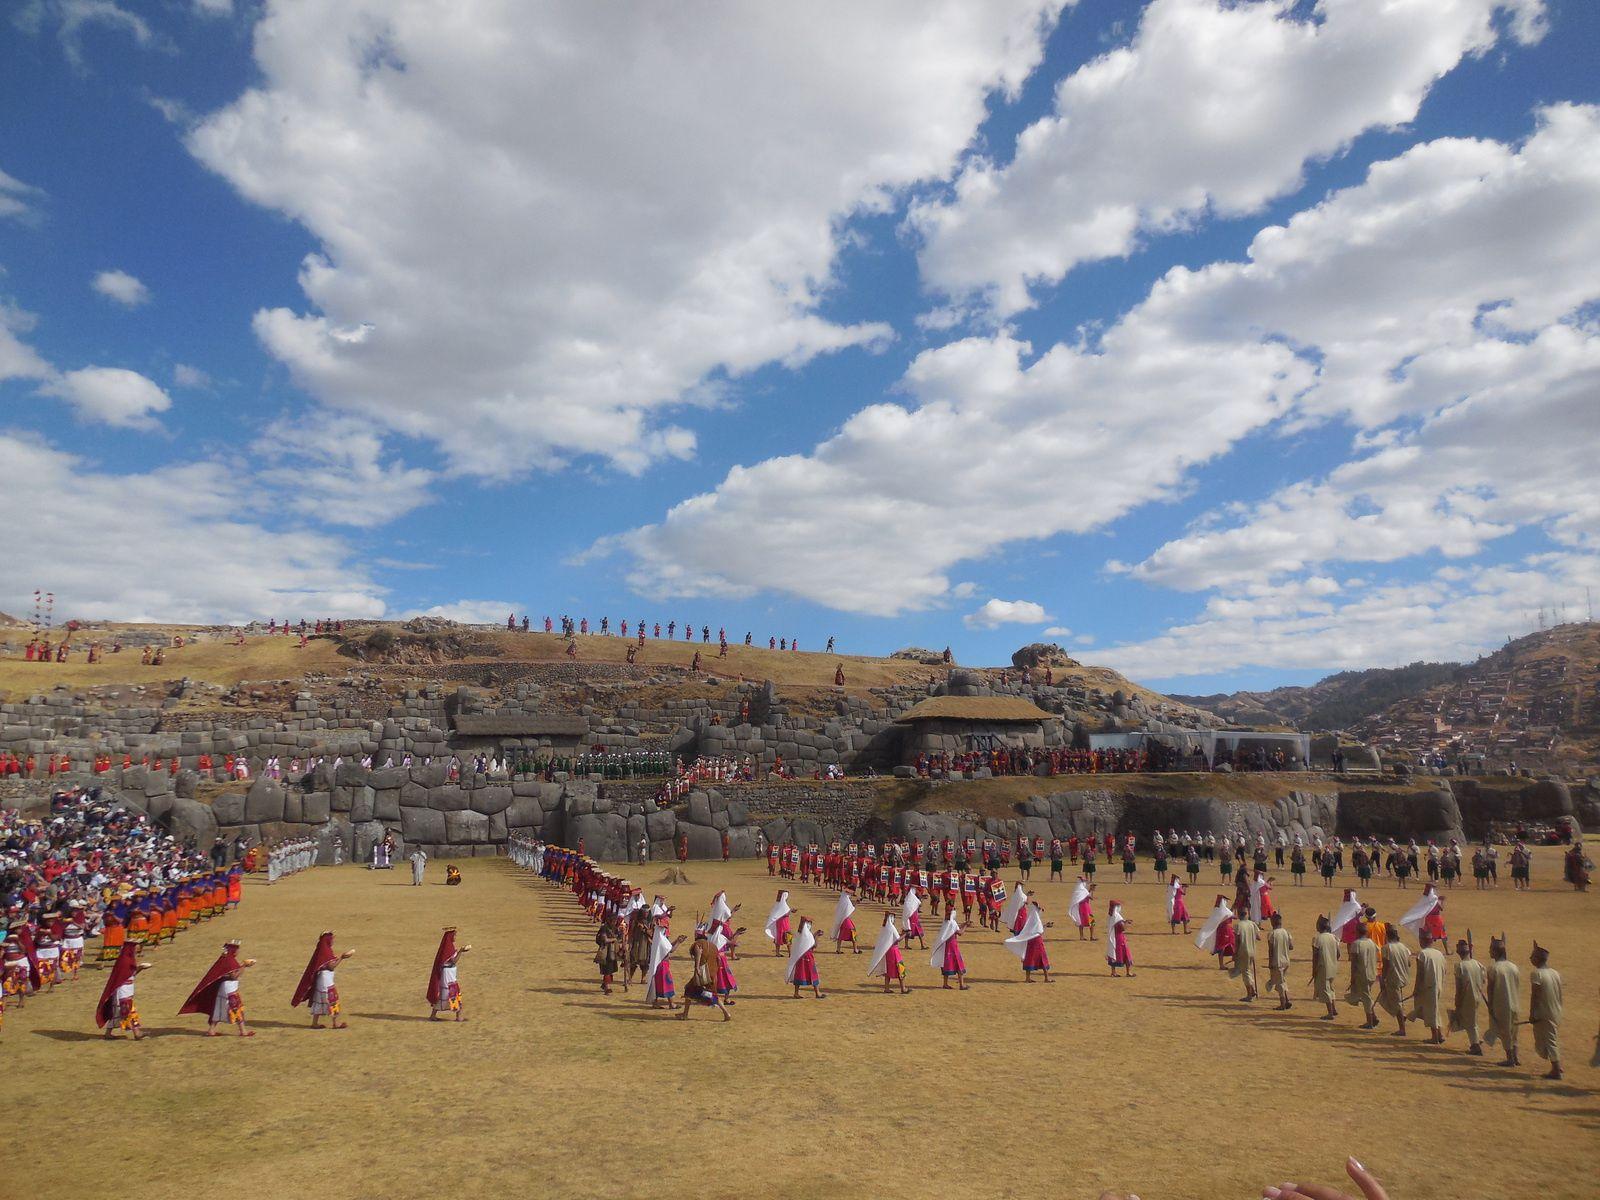 Jour 8: Cuzco - La fête de l'Inti Raymi -